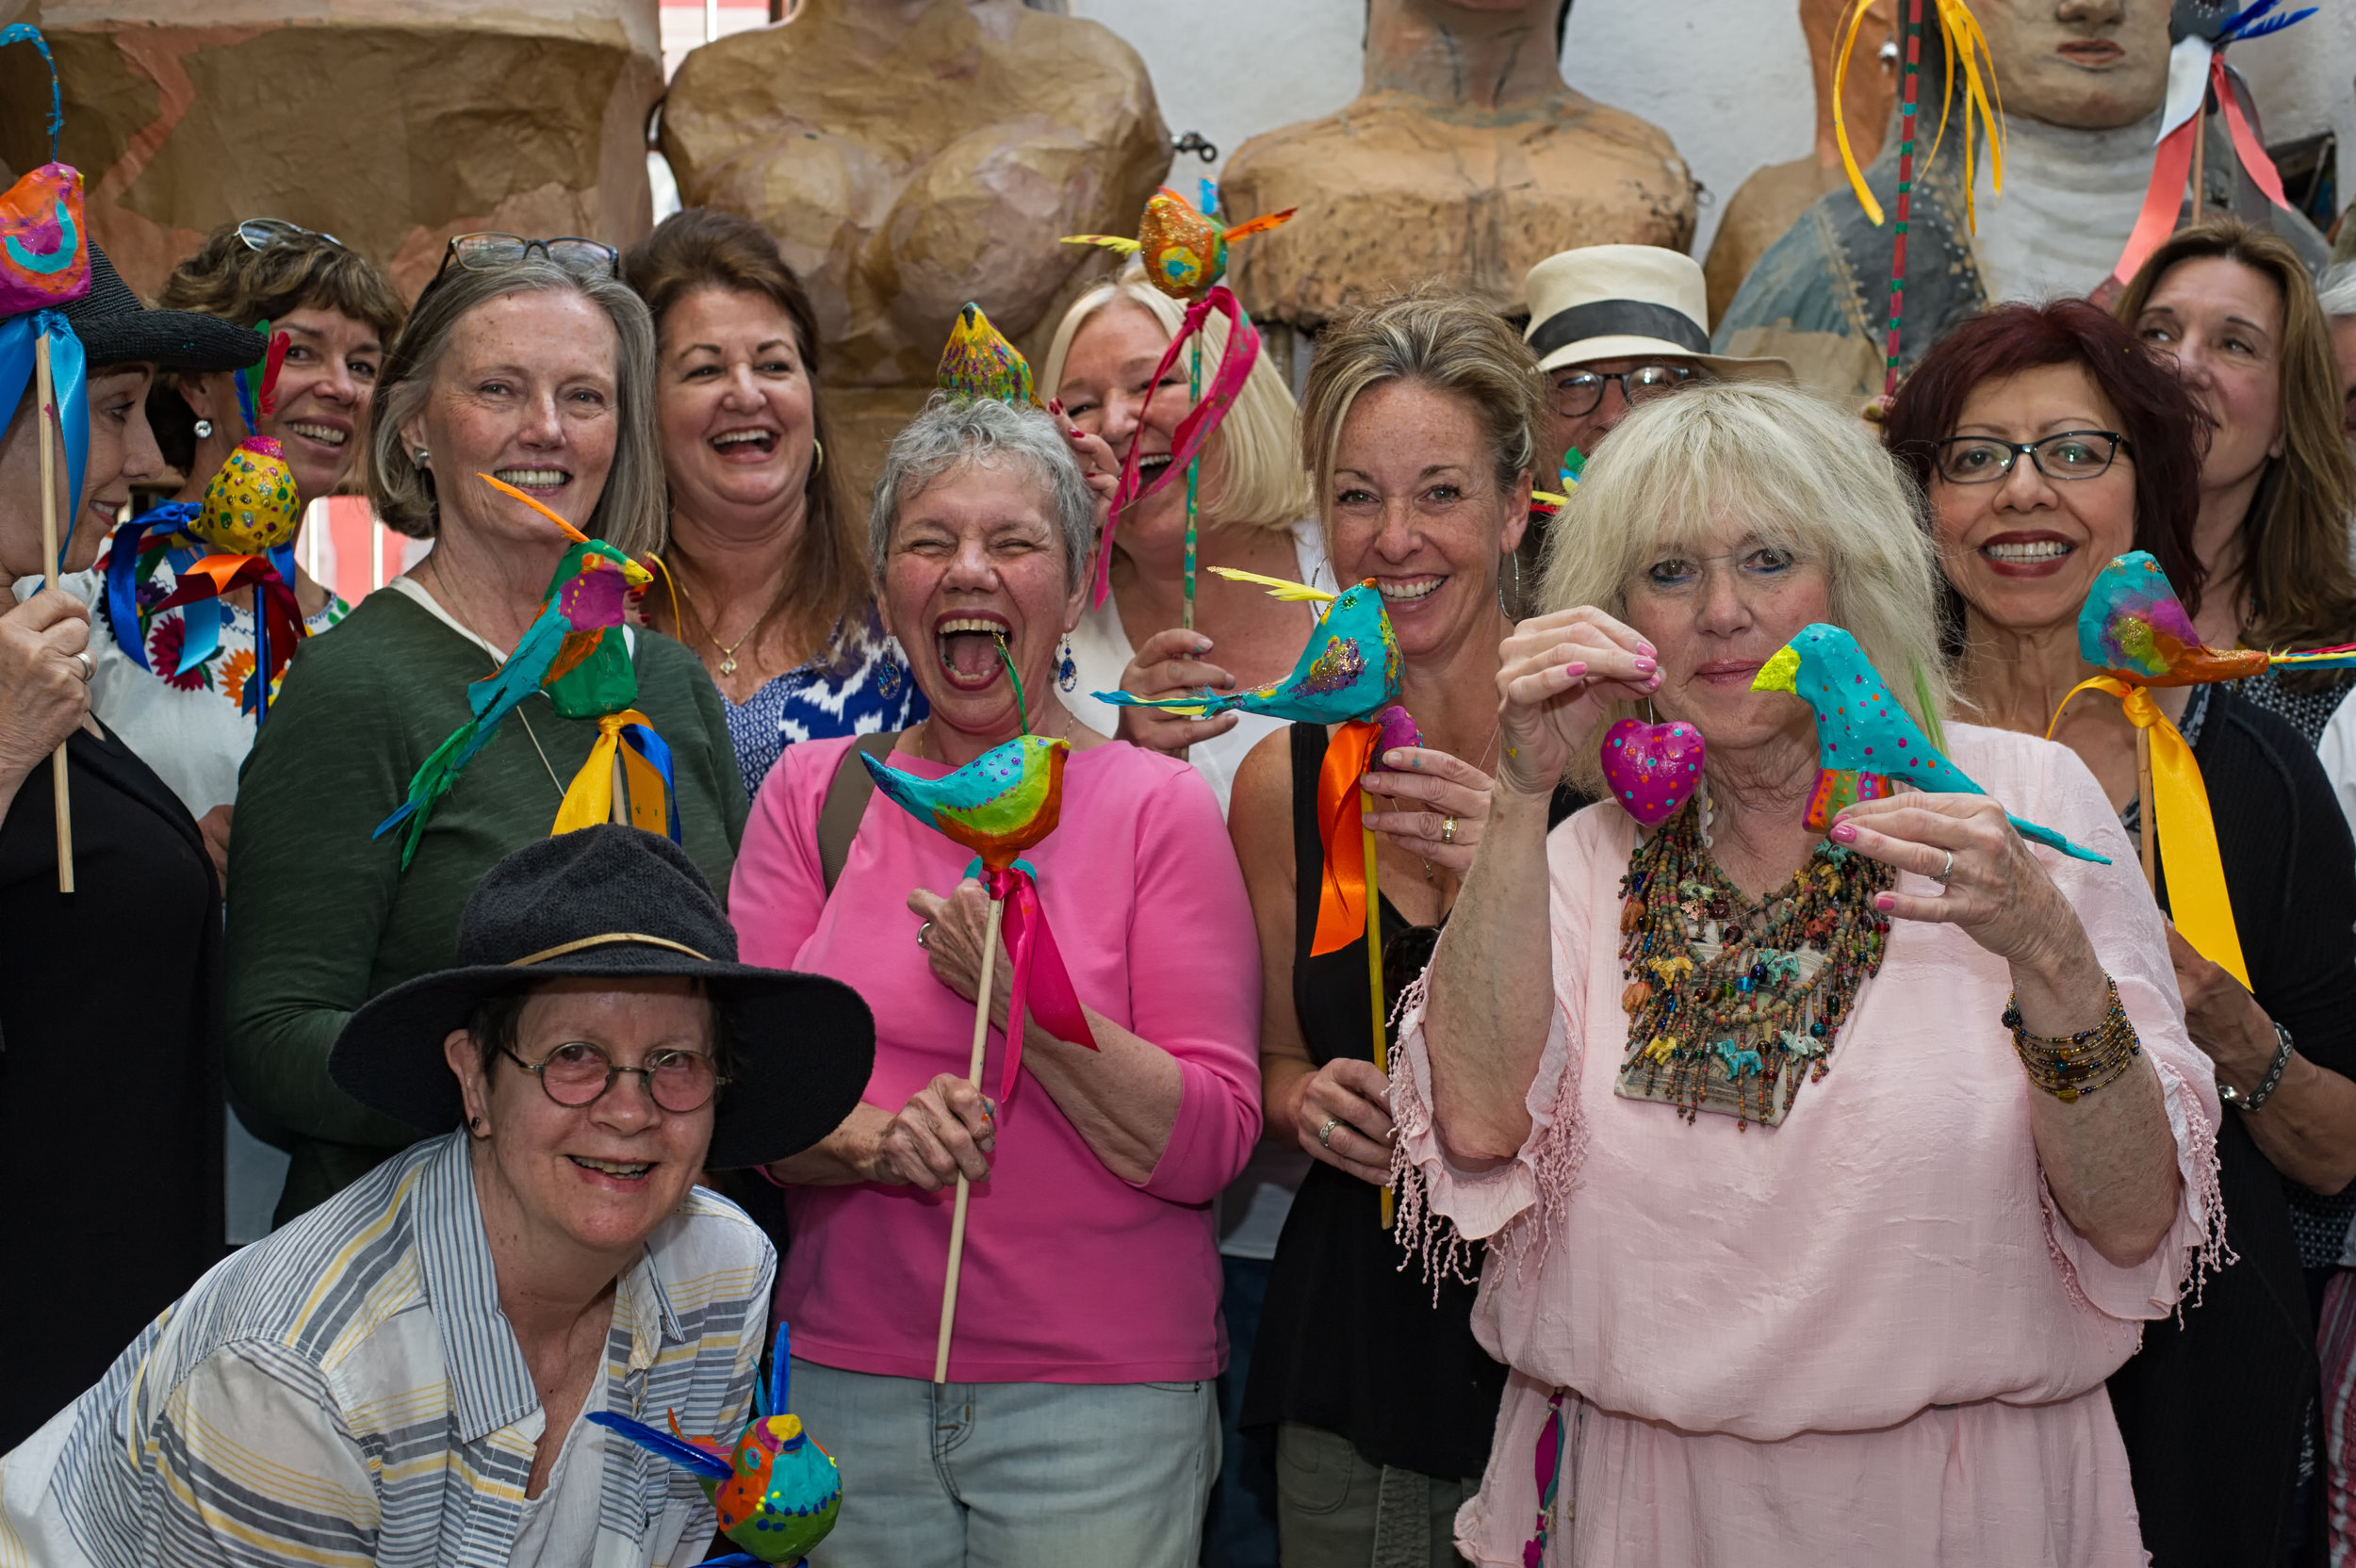 Fiesta Flores with Lynn Whipple and Carla Sonheim